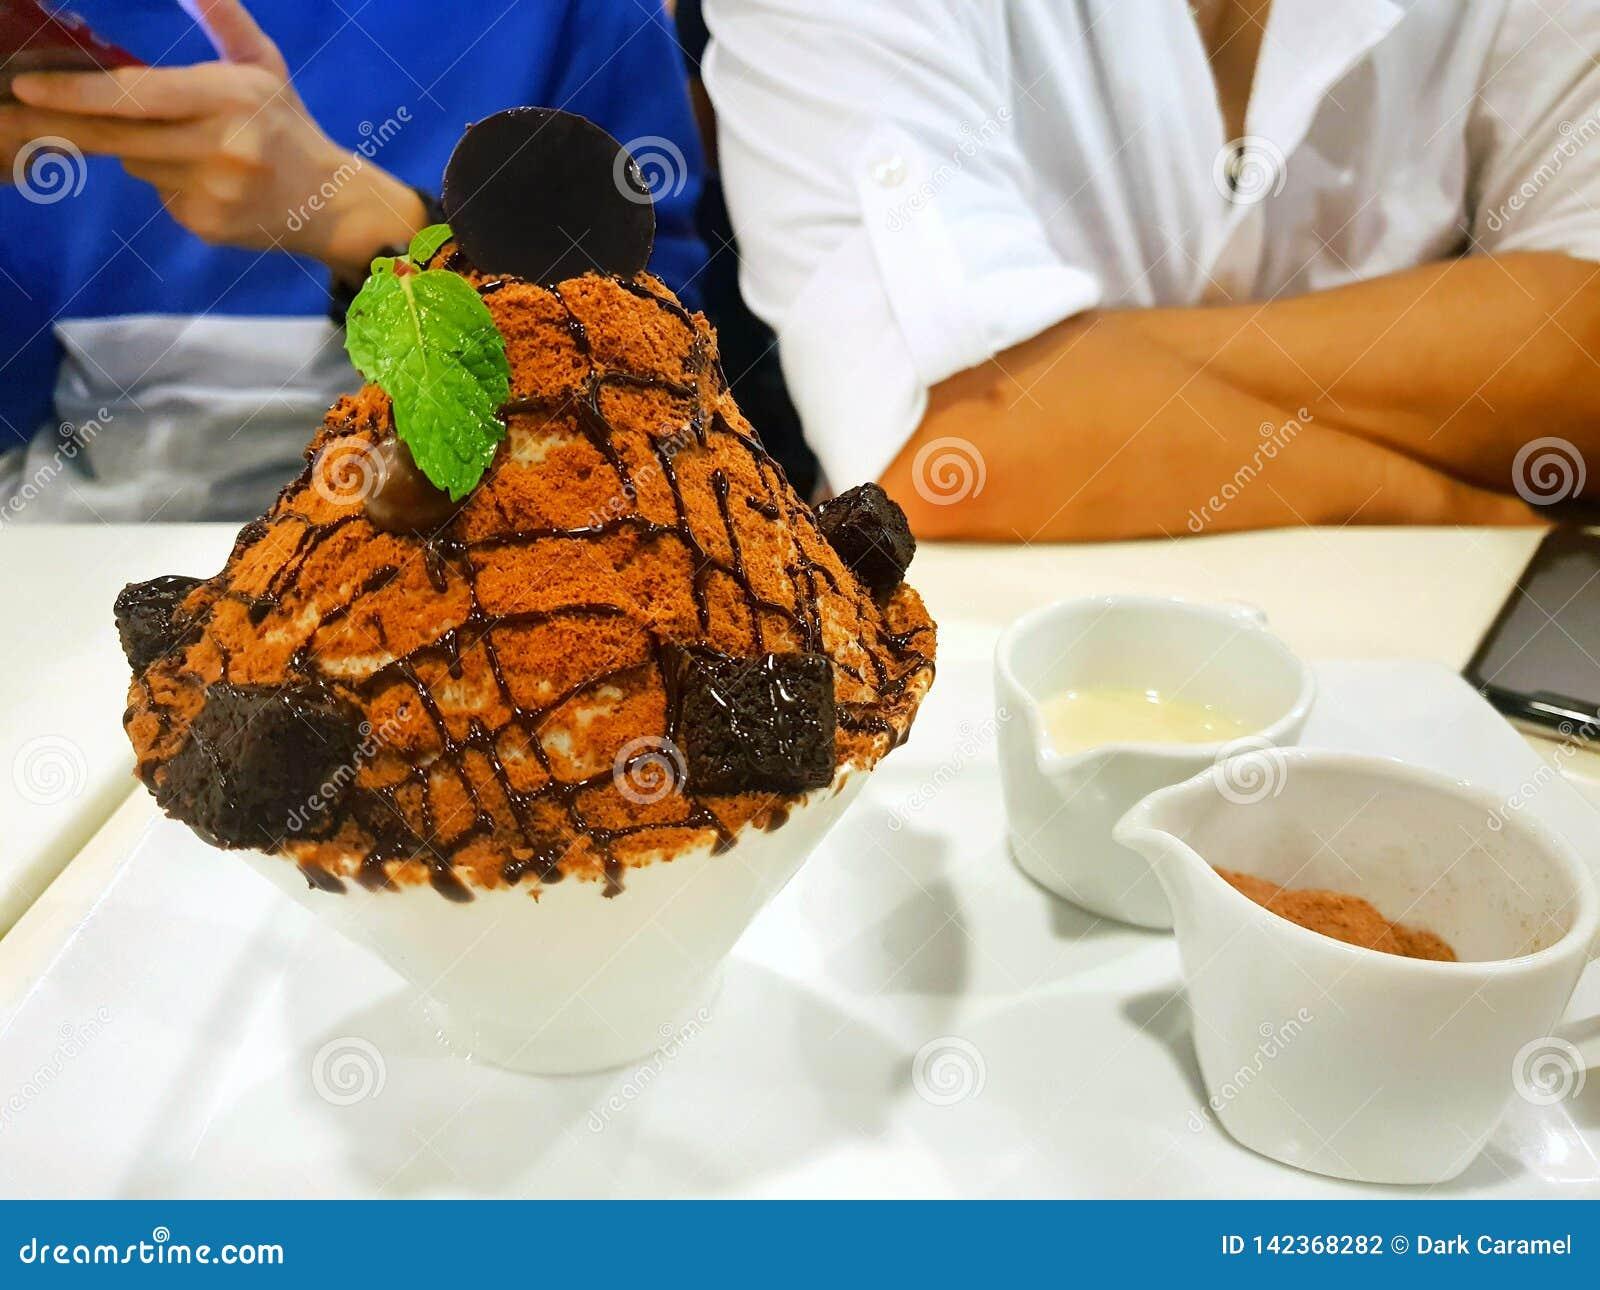 Bingsu dessert on blurred people as a background, Closeup choco volcano bingsu